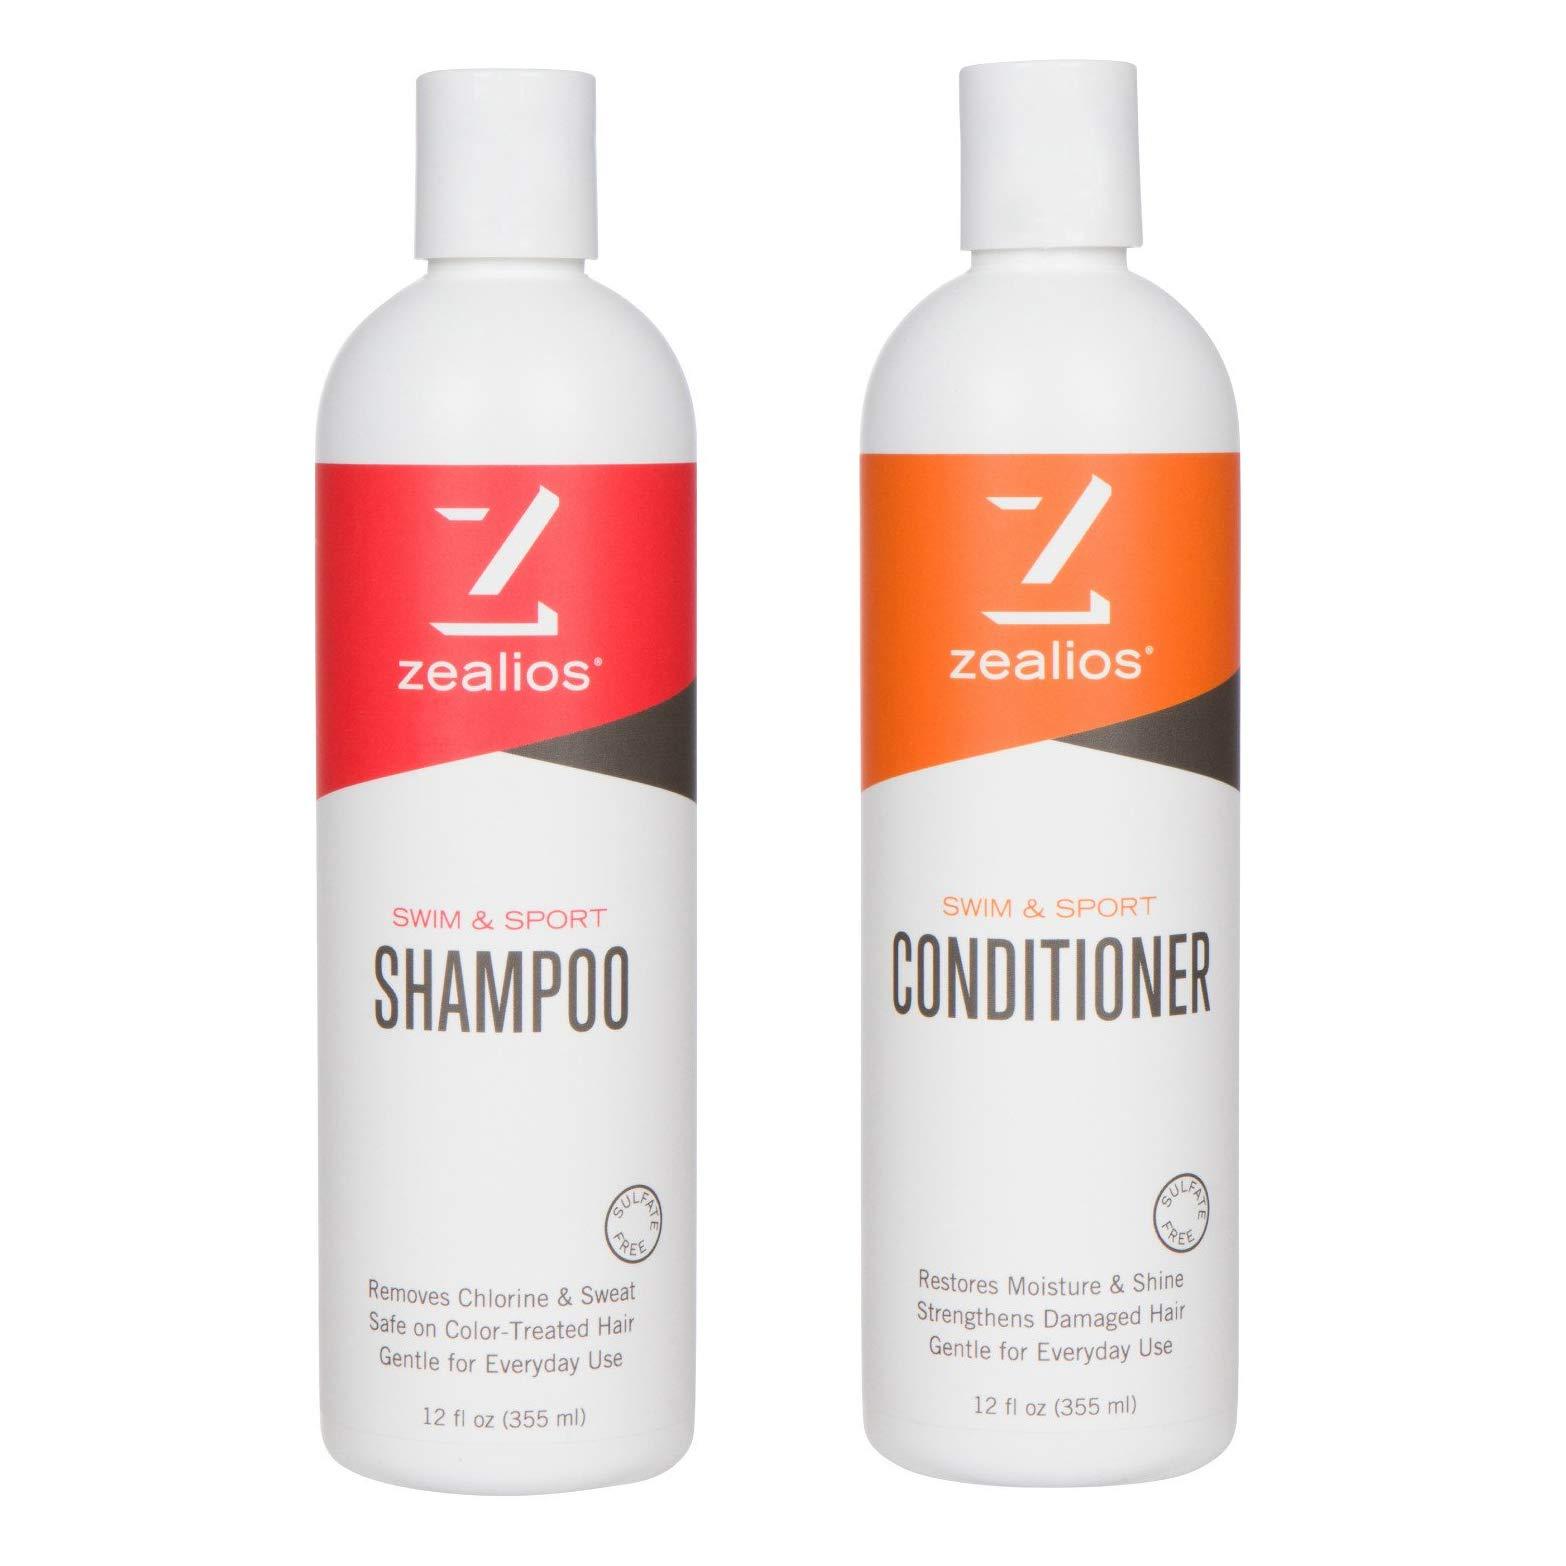 Zealios Sulfate Free Shampoo & Conditioner Moisturizing Renewal Kit - Swim & Sport Formula Safe For Treated Hair & Chlorine Removal 12 fl oz Each by Zealios